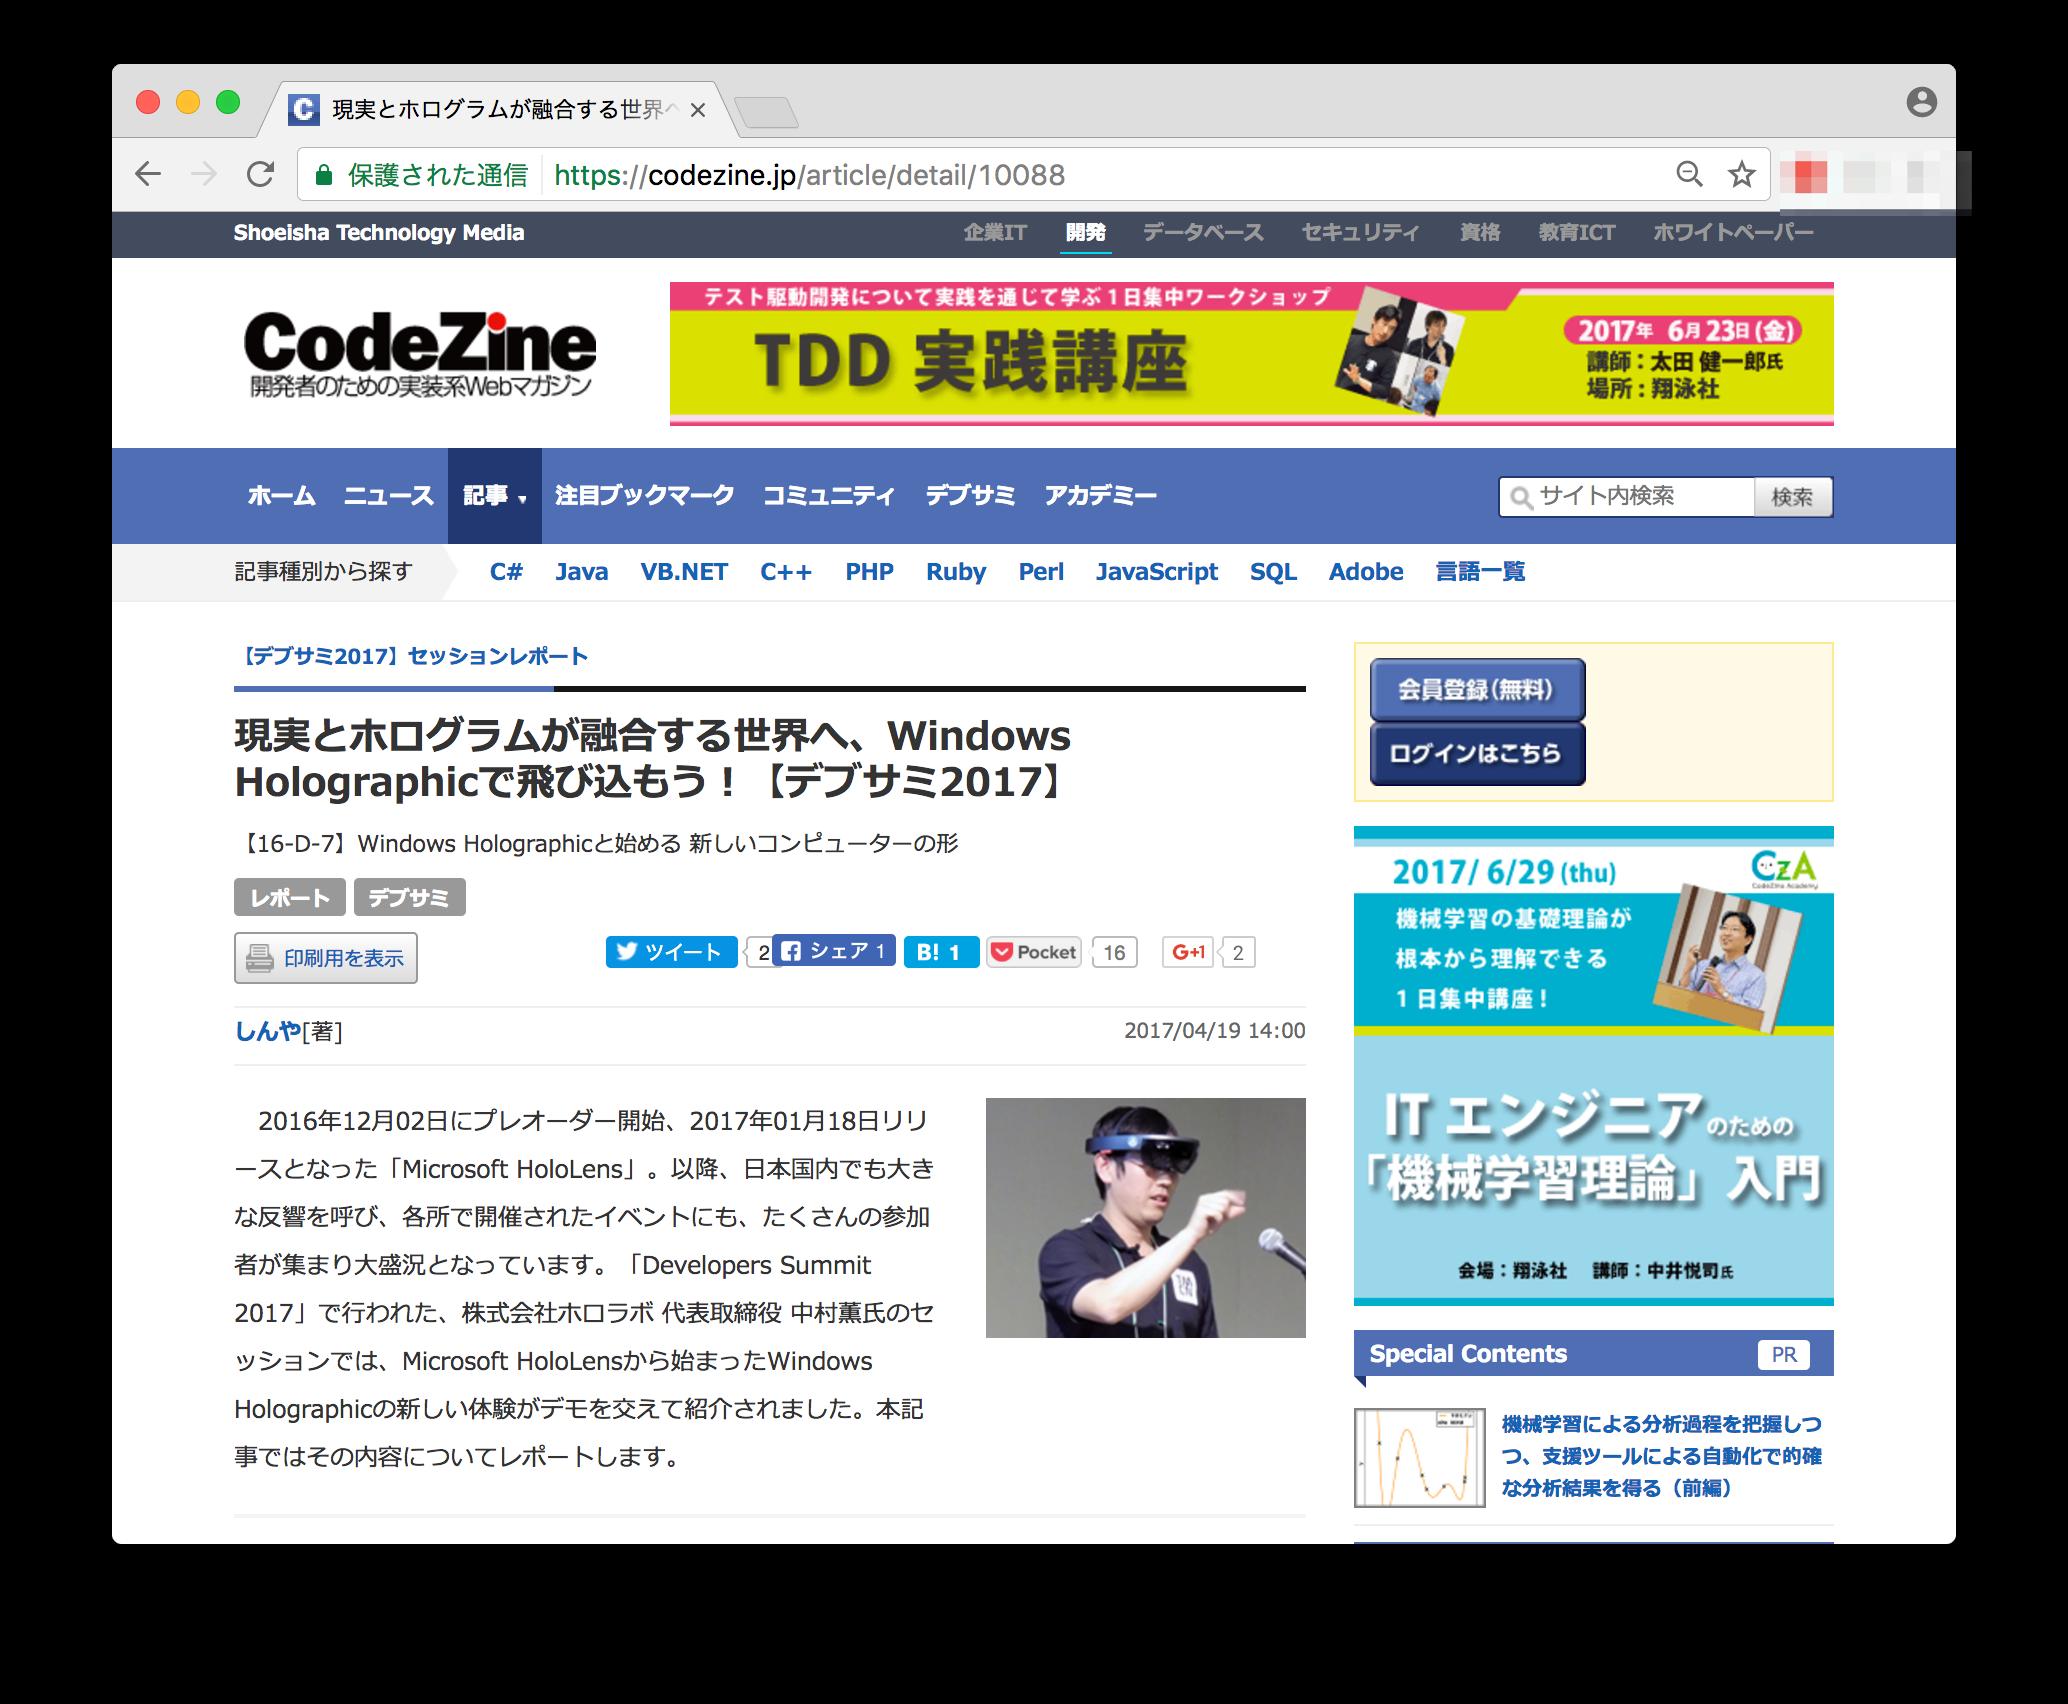 devsumi2017-codezine-16-d-7